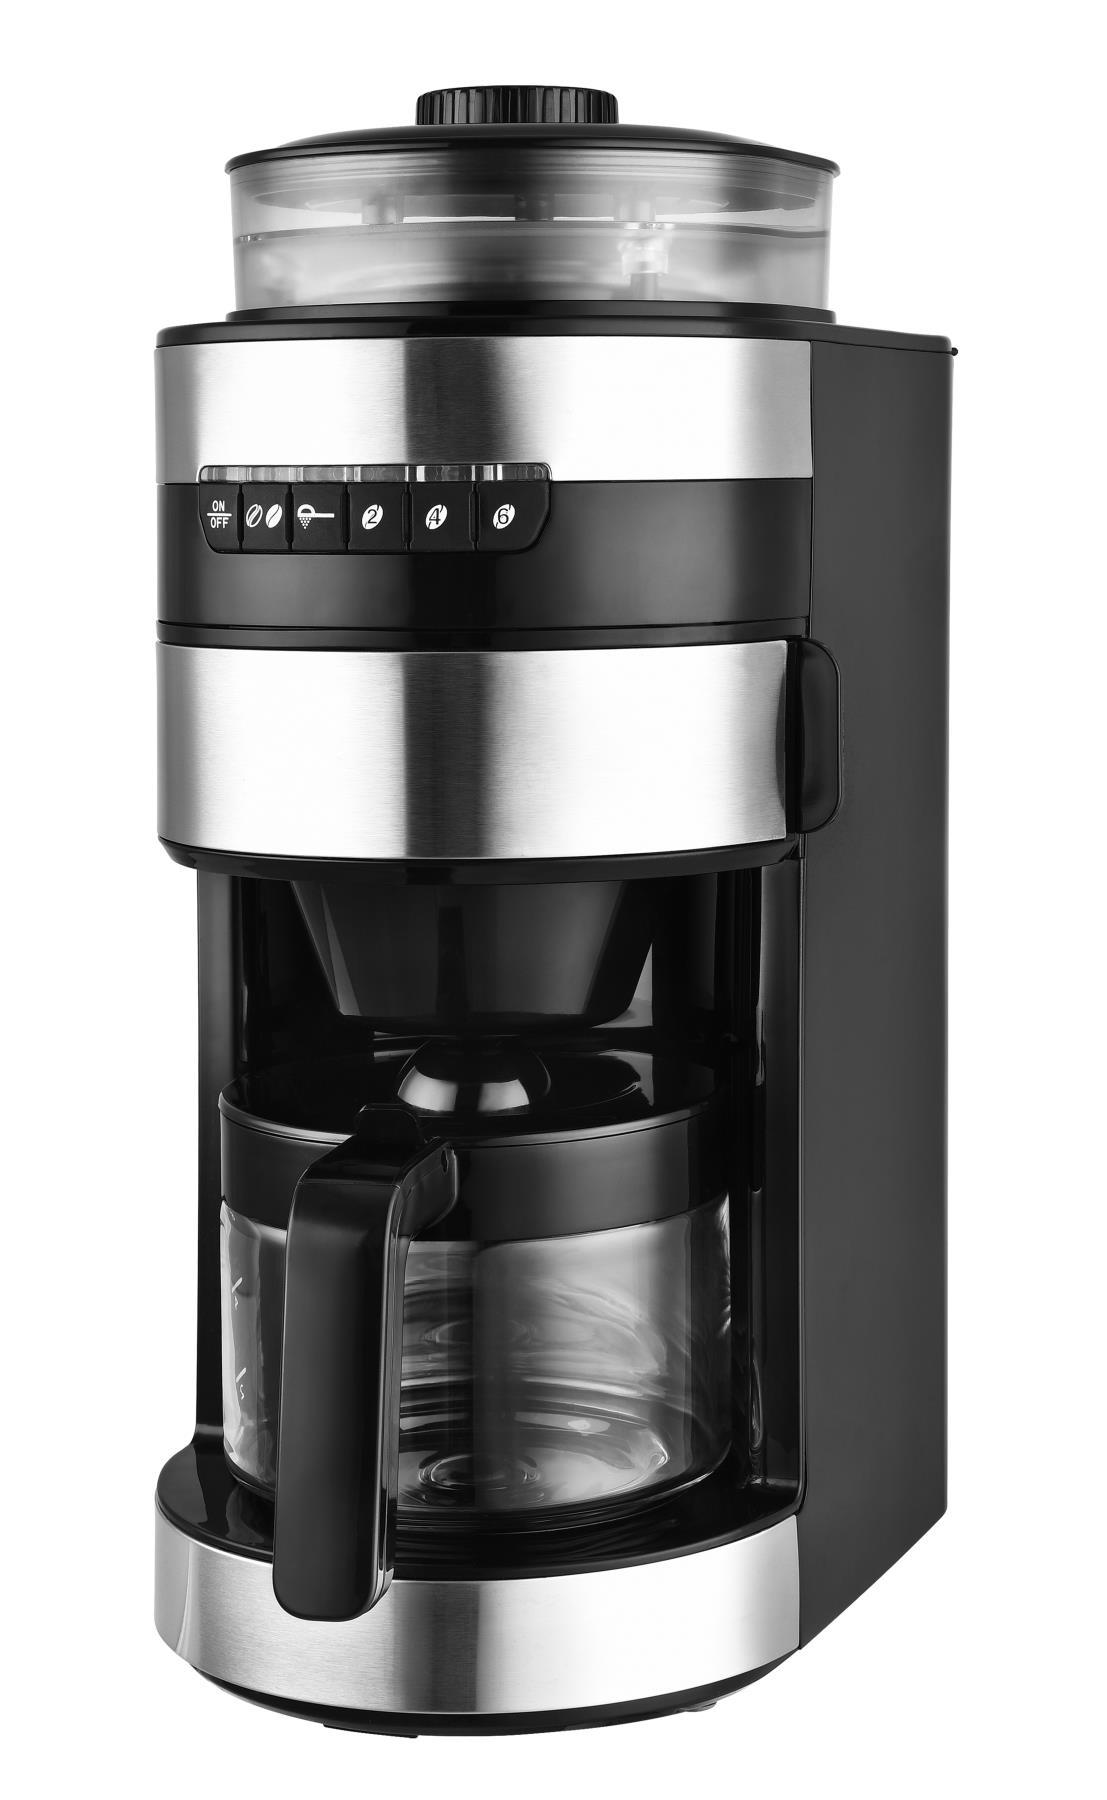 2in1 Kaffeeautomat Mahlwerk Vollautomat Bohnen Mühle 0,85L*42232